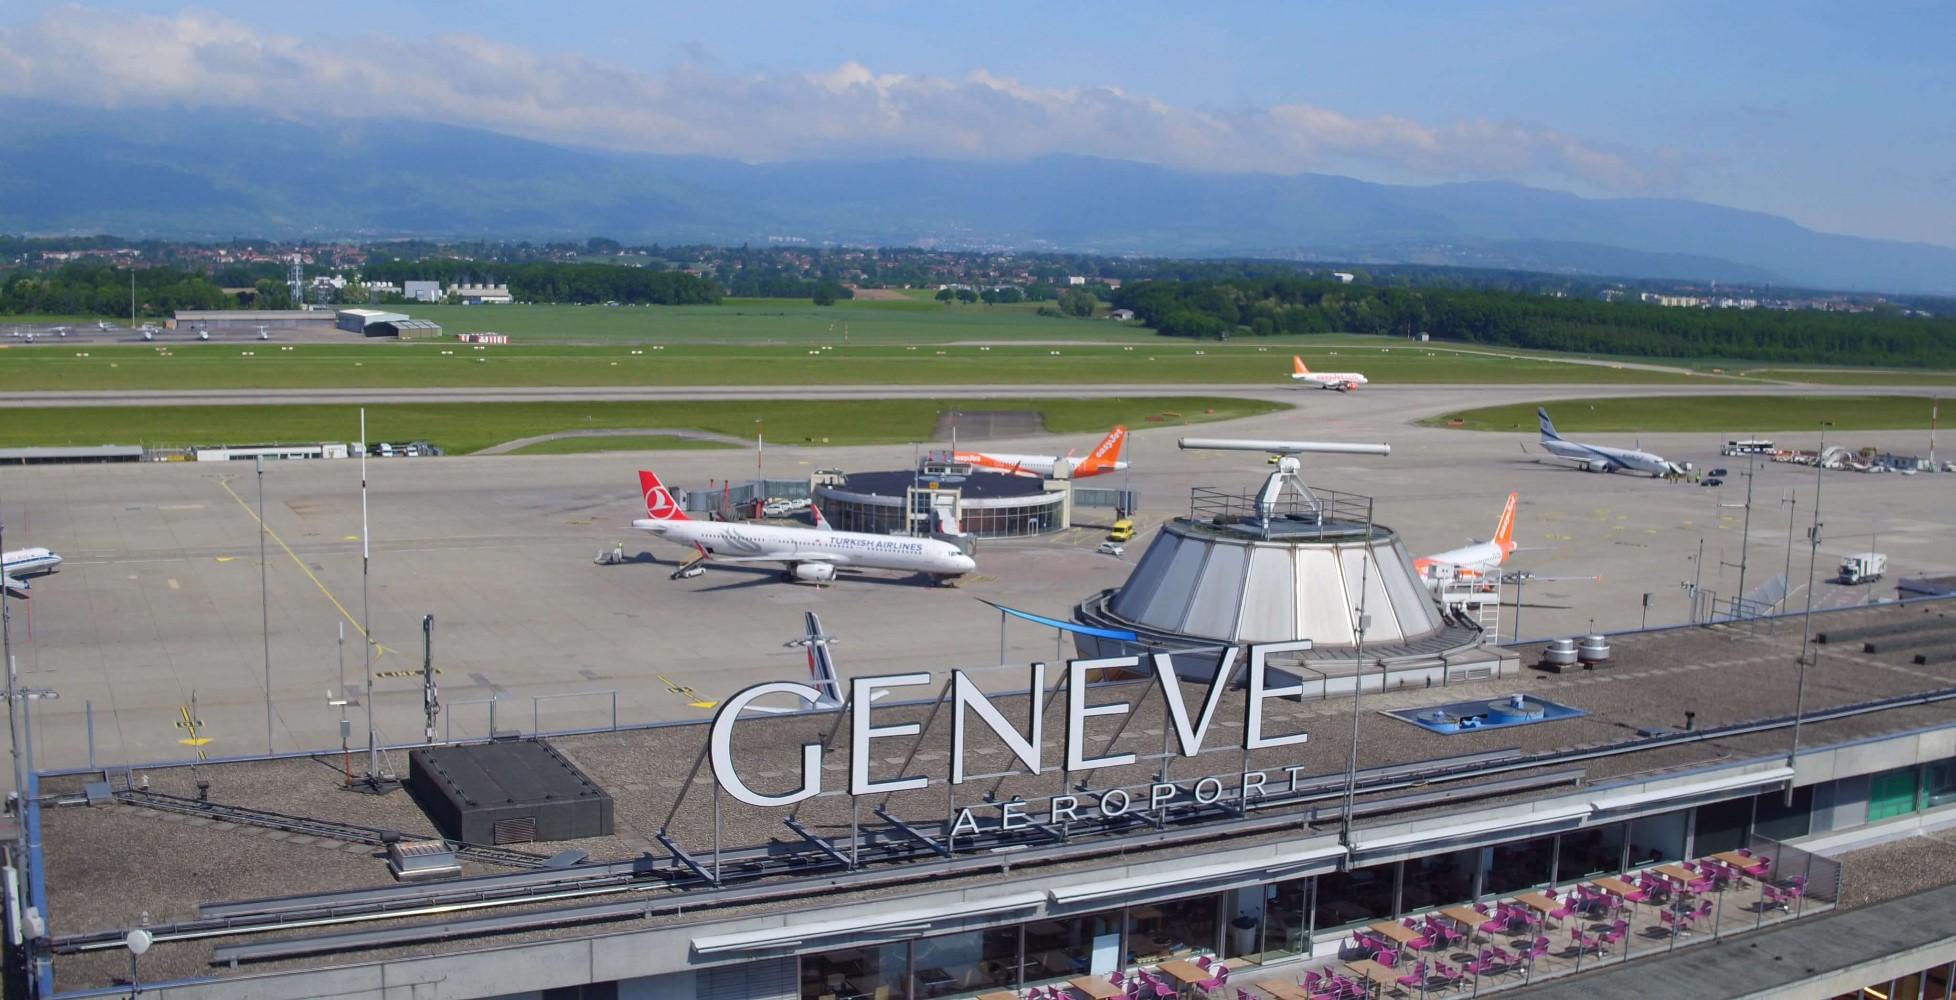 Sân bay Geneva (Geneva, Thụy Sĩ)